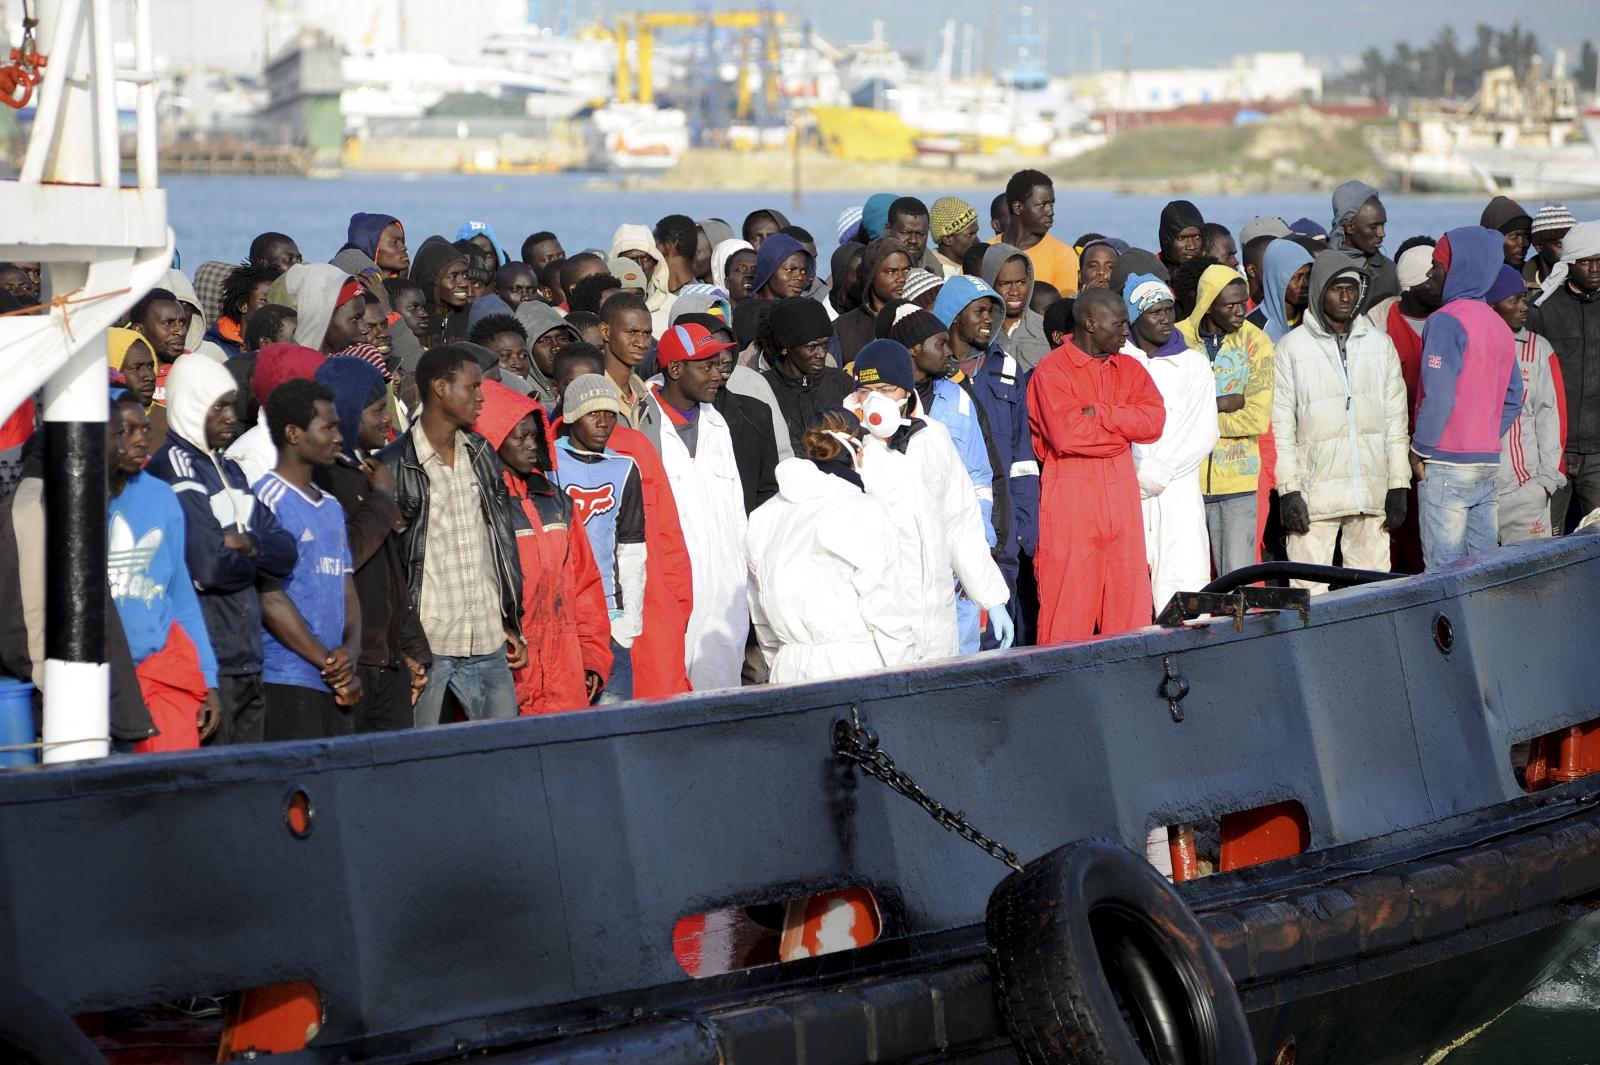 Mediterranean migrants crisis